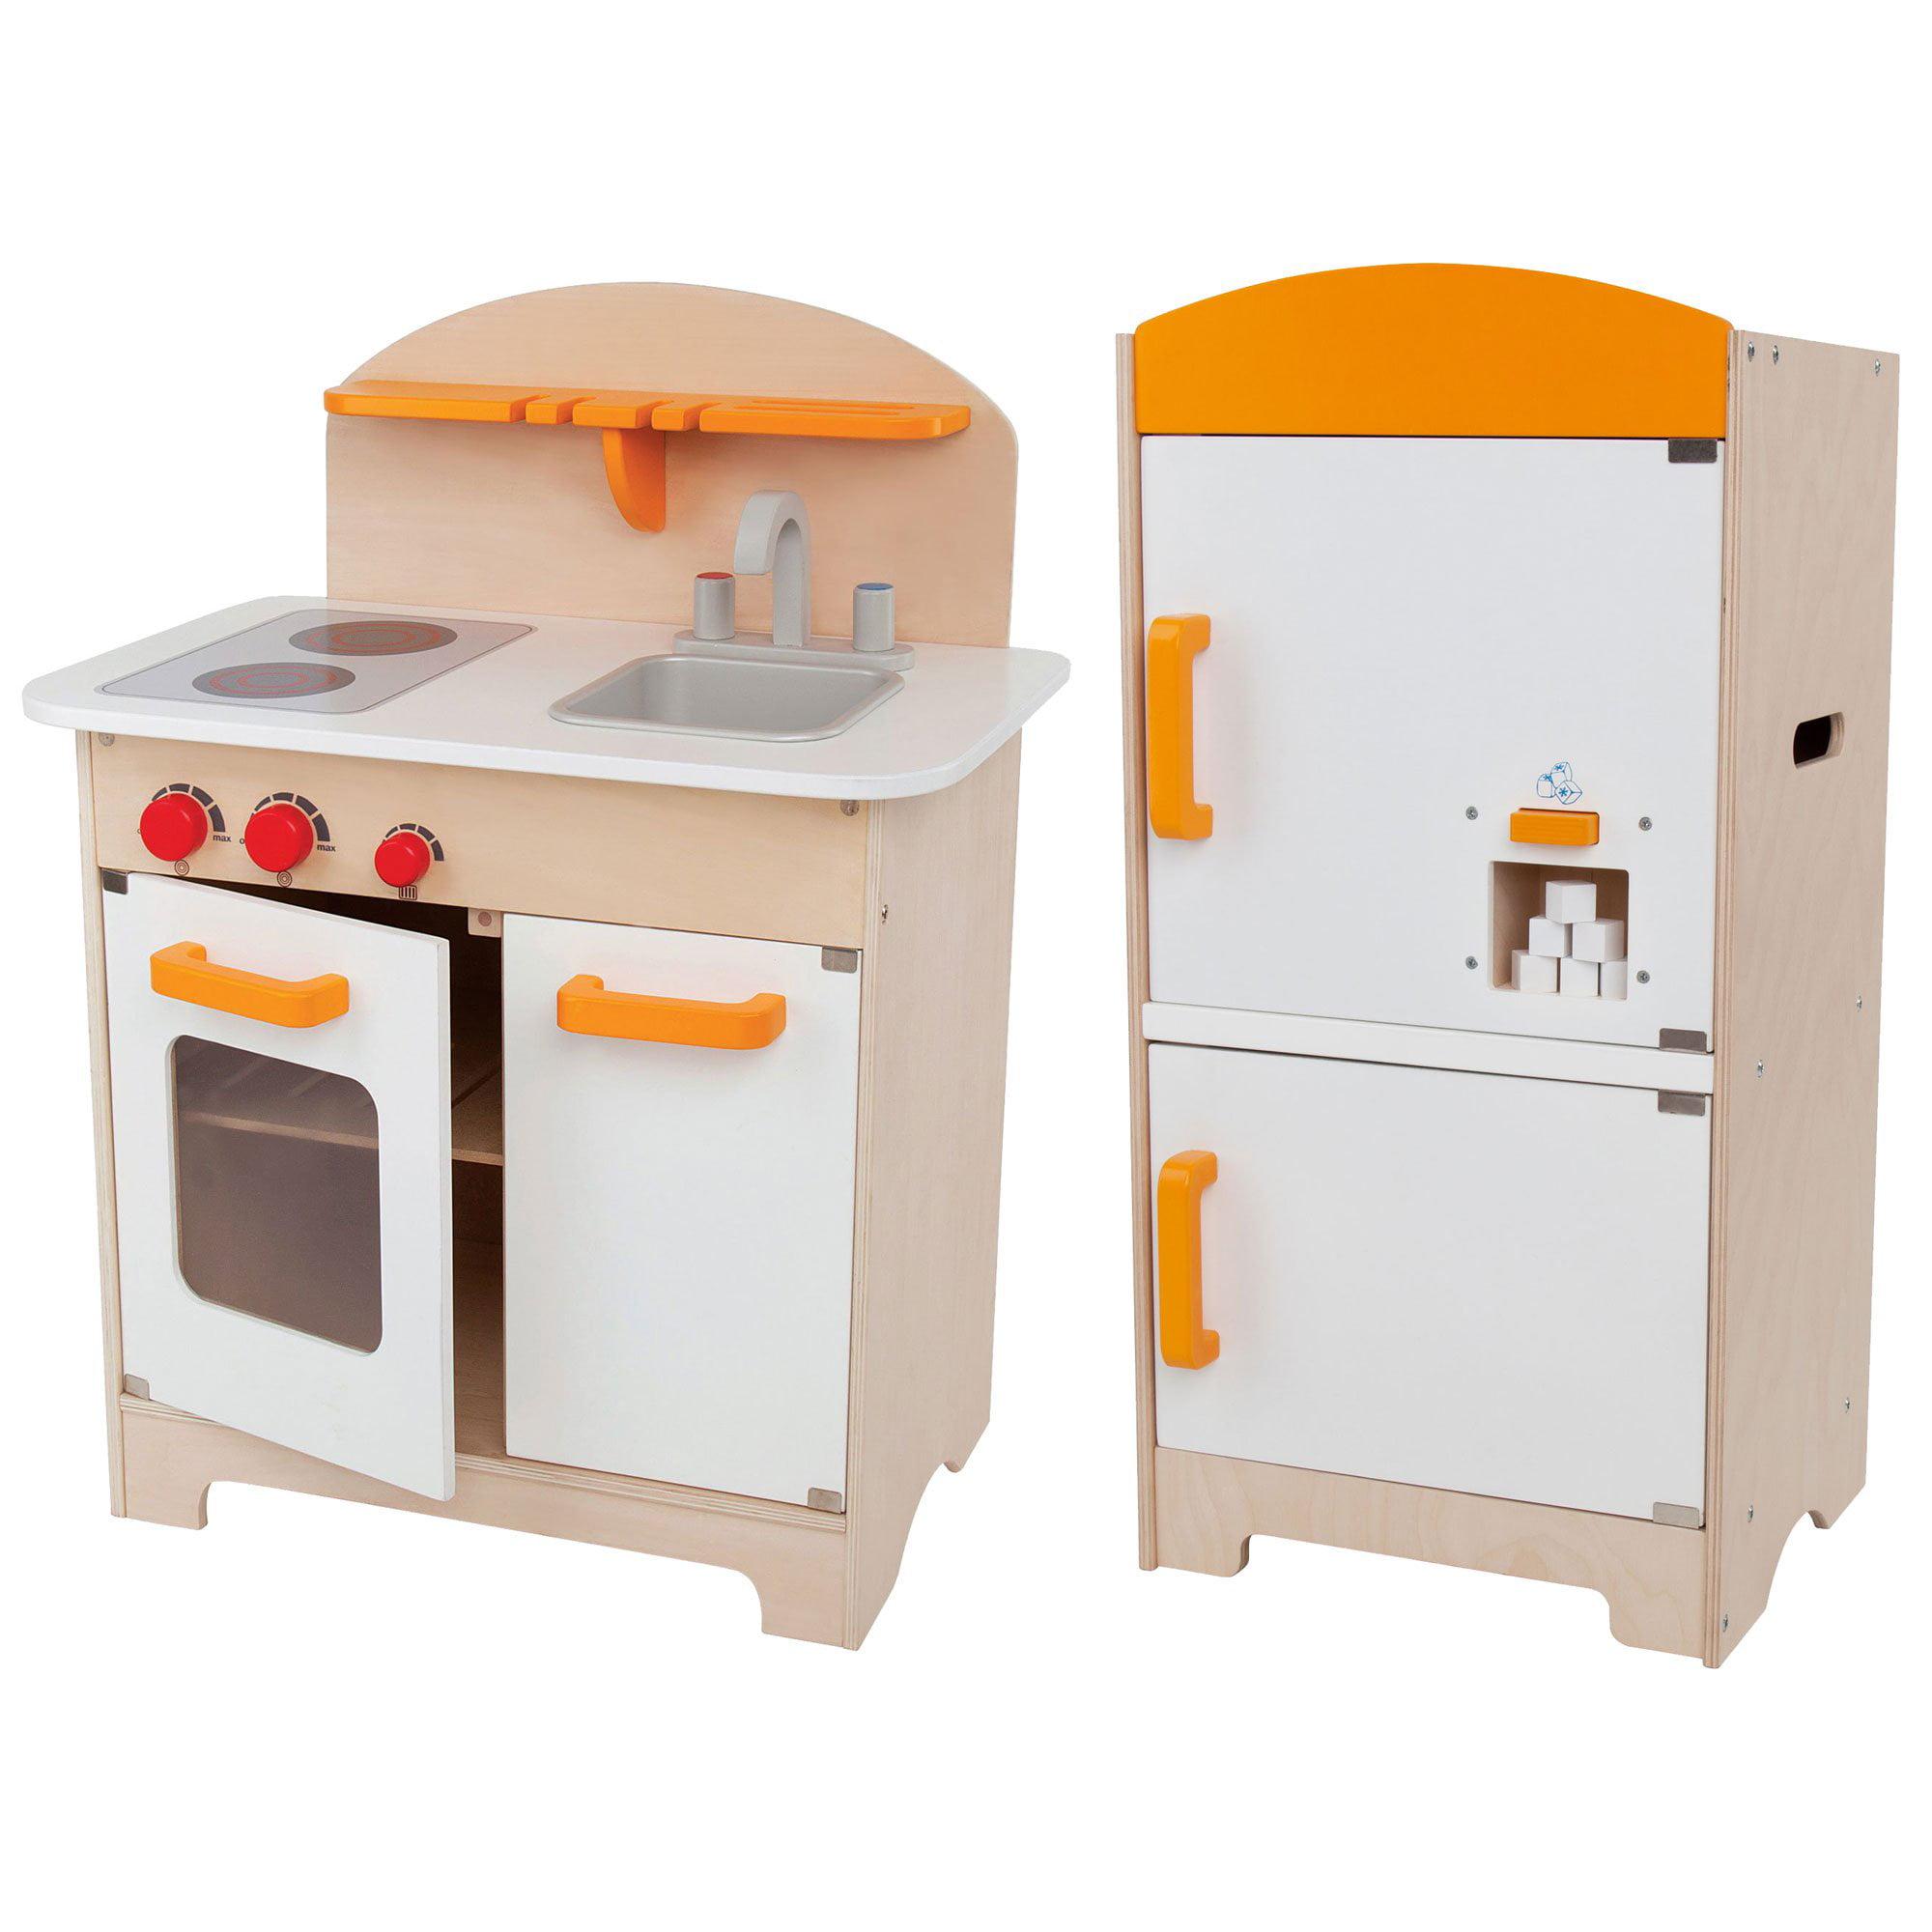 Hape Gourmet Kitchen Toddler & Kids Wood Play Pretend Kit...